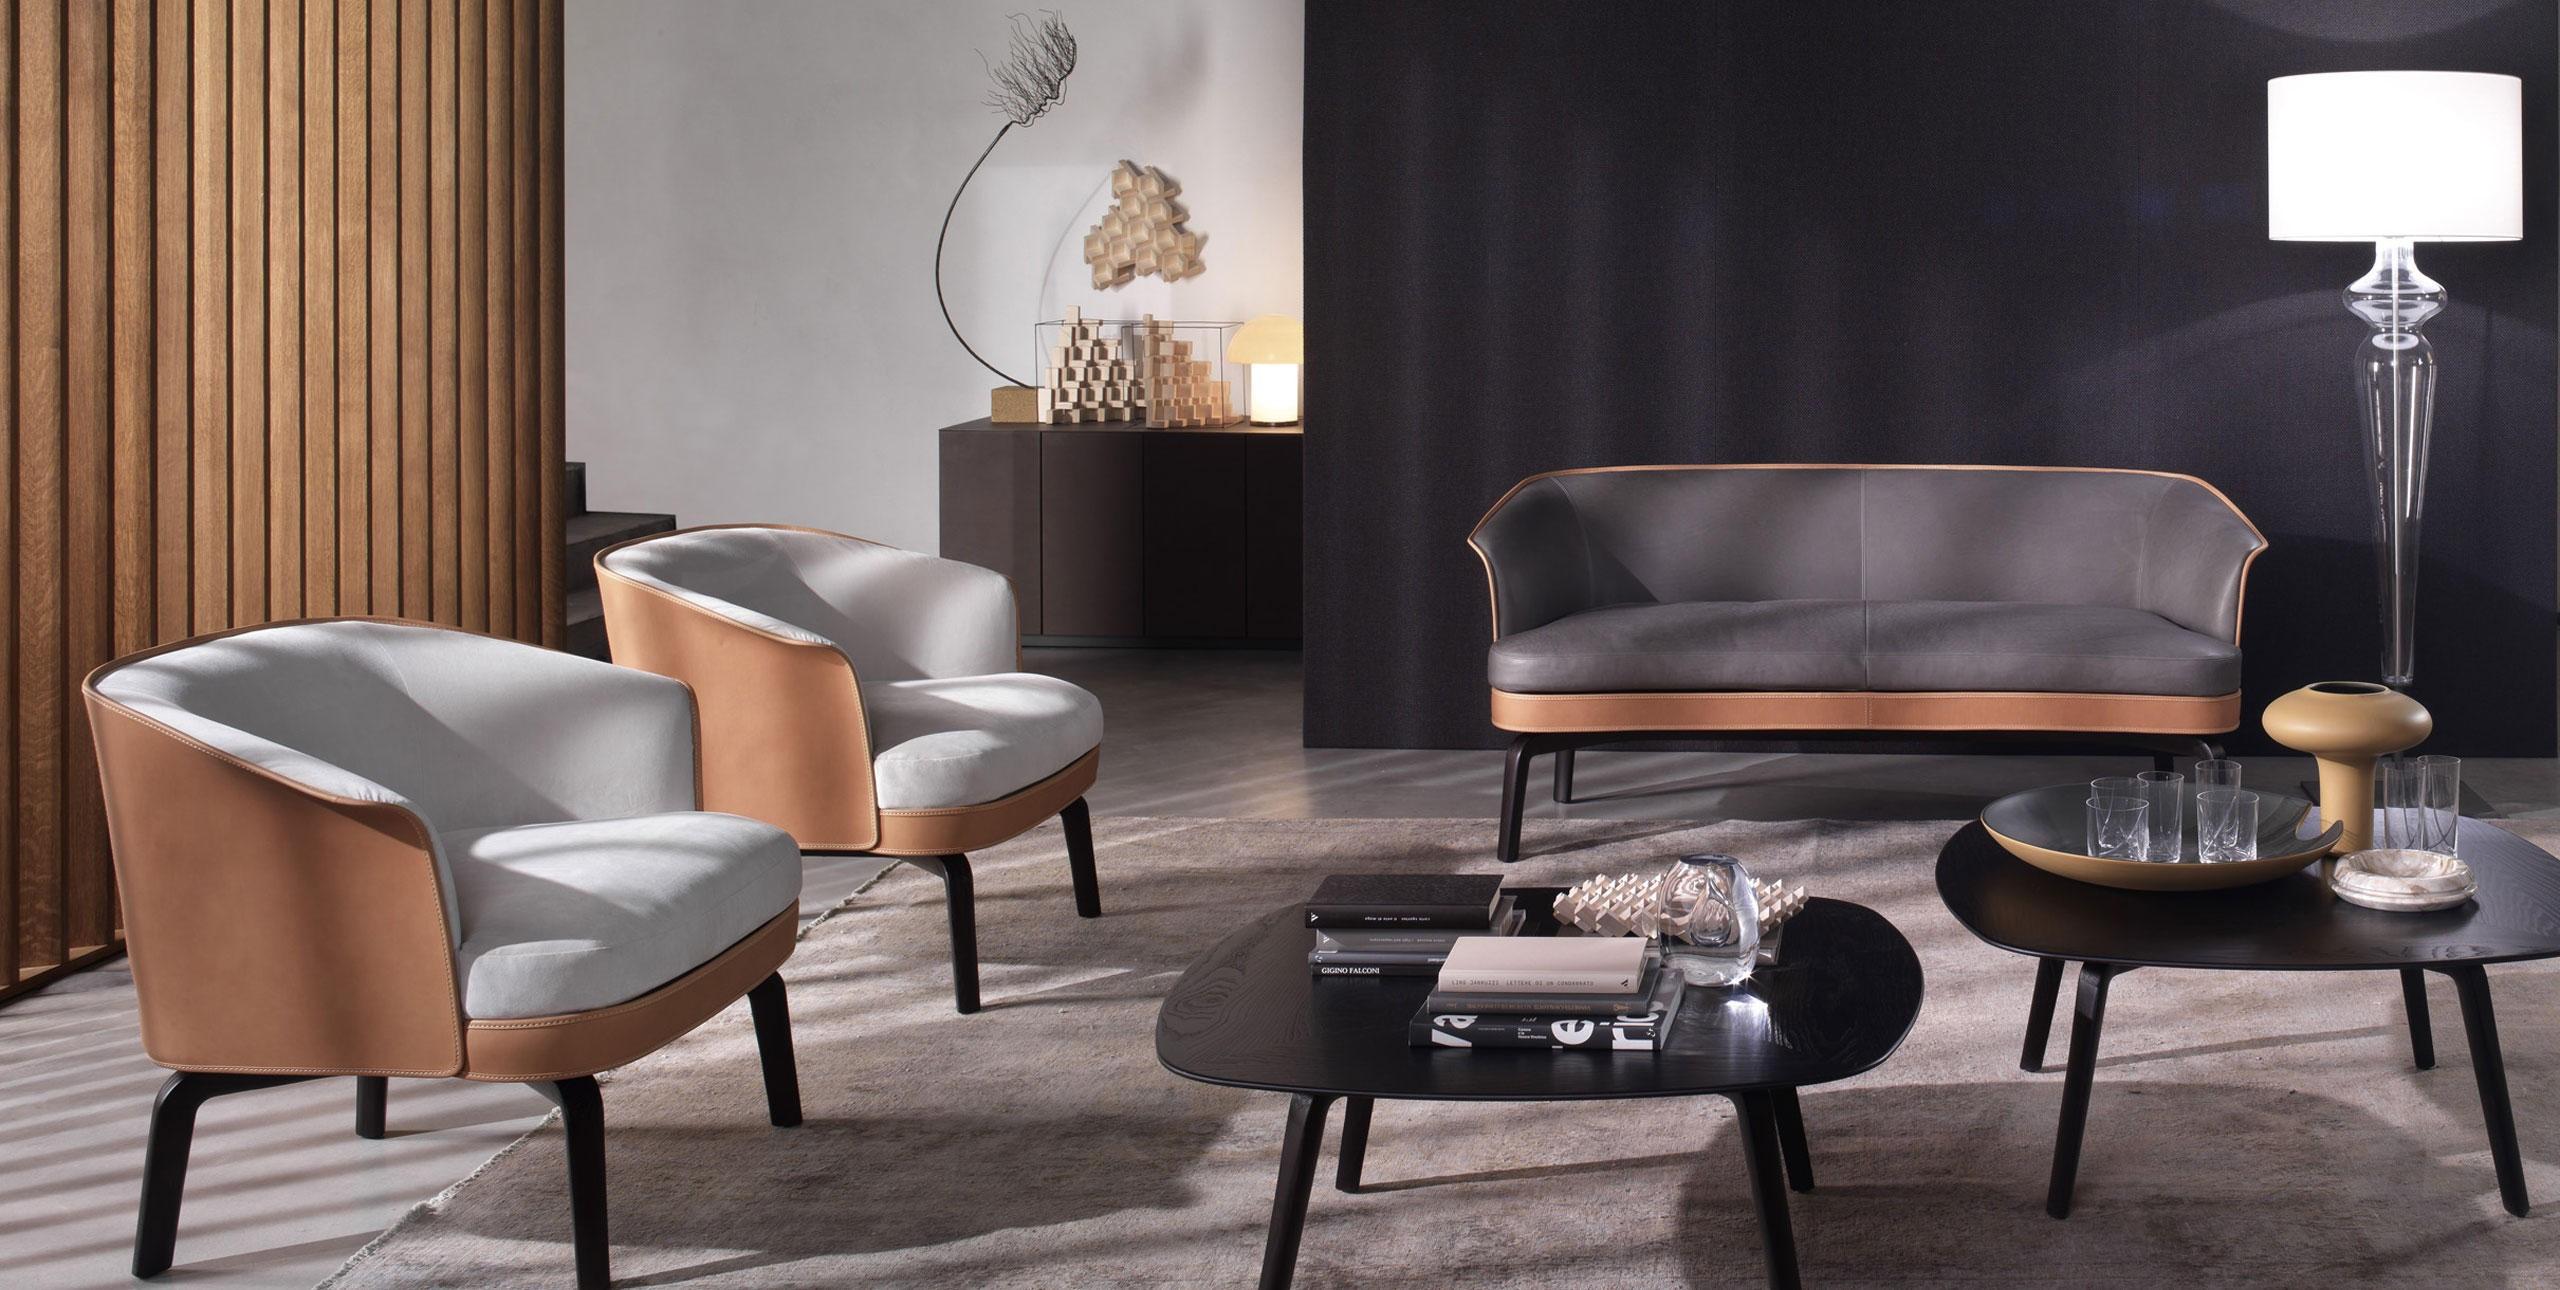 poltrona frau nivola armchair. Black Bedroom Furniture Sets. Home Design Ideas